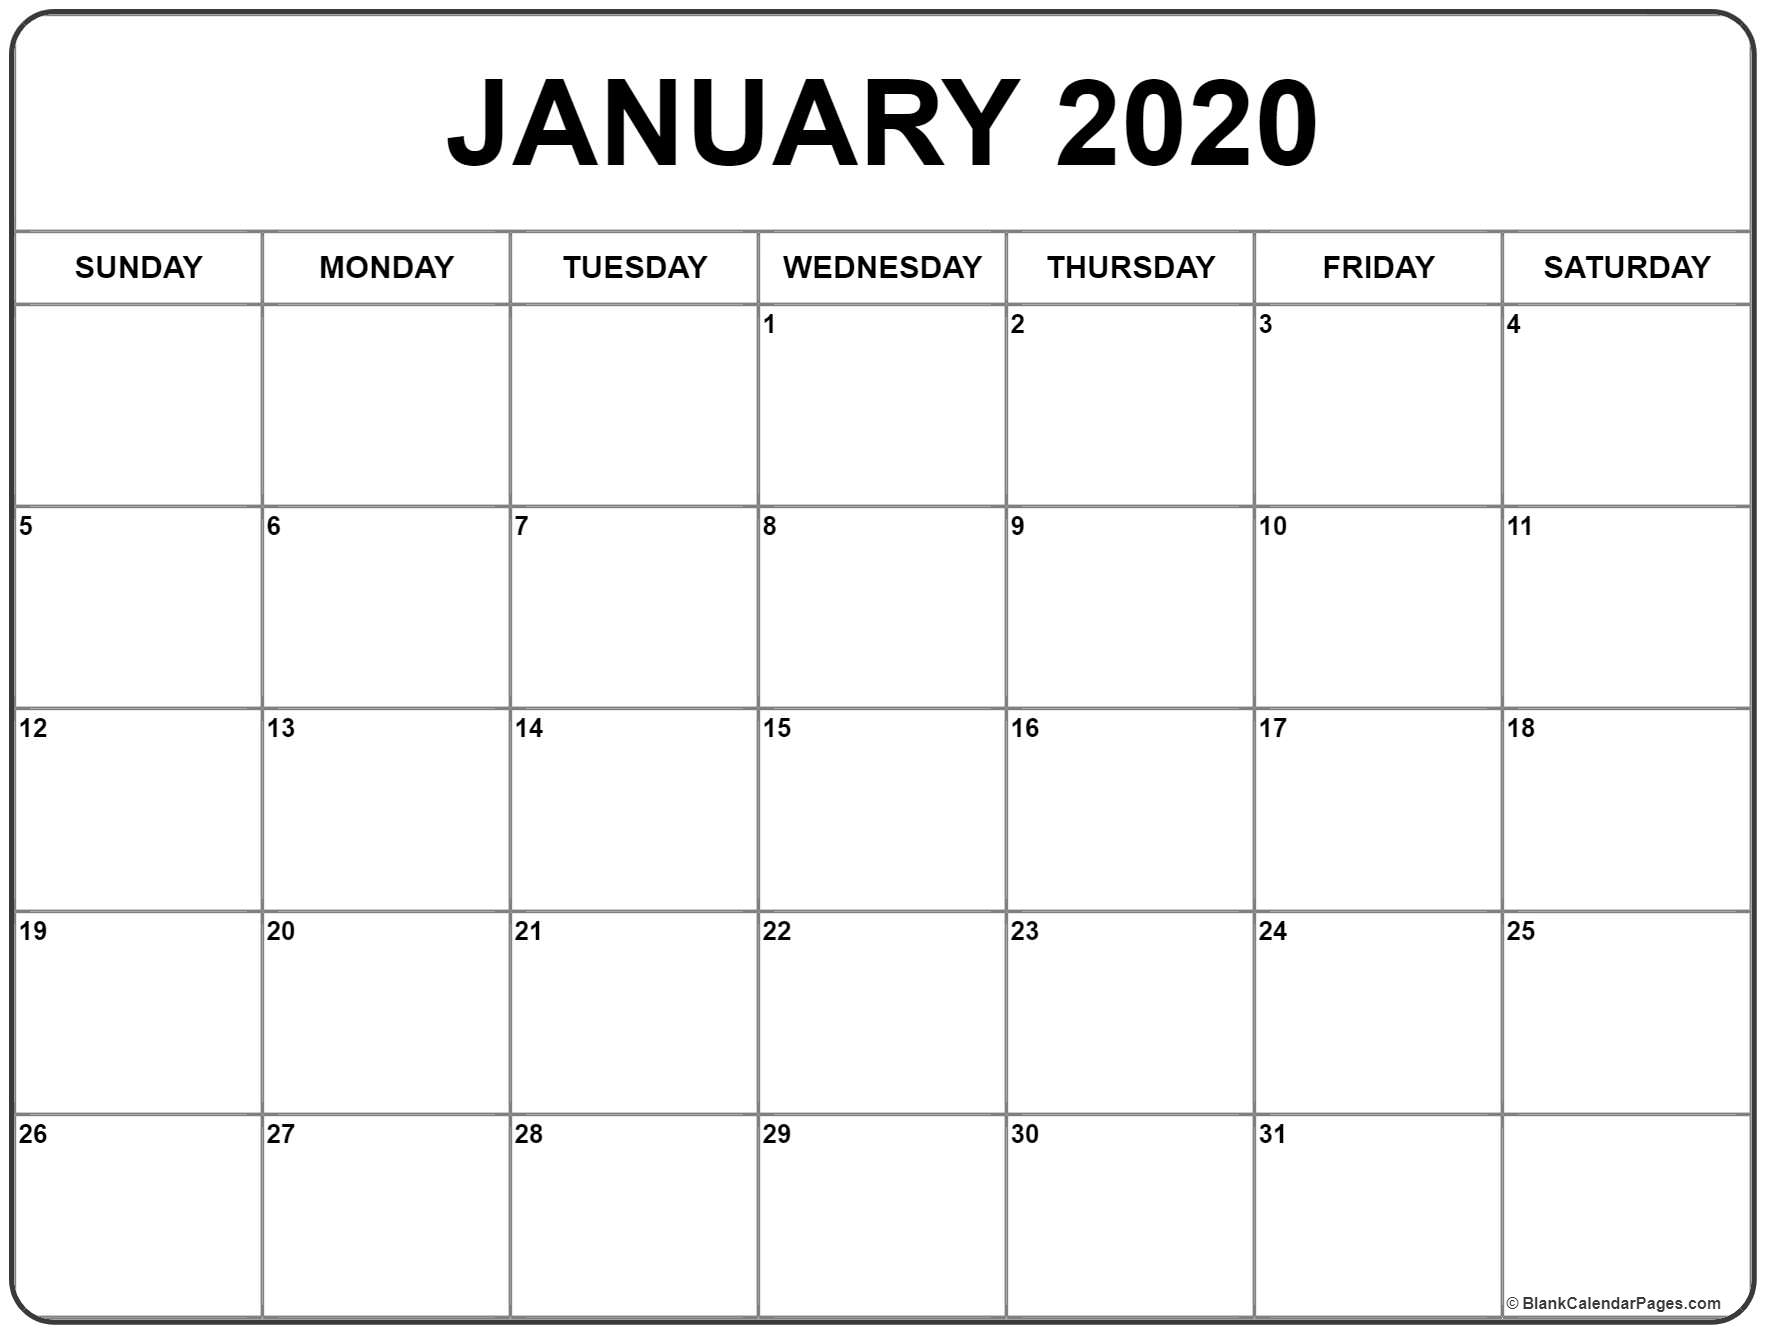 January 2020 Calendar | Free Printable Monthly Calendars with Calendar 2020 Printable Calendar Starting With Monday